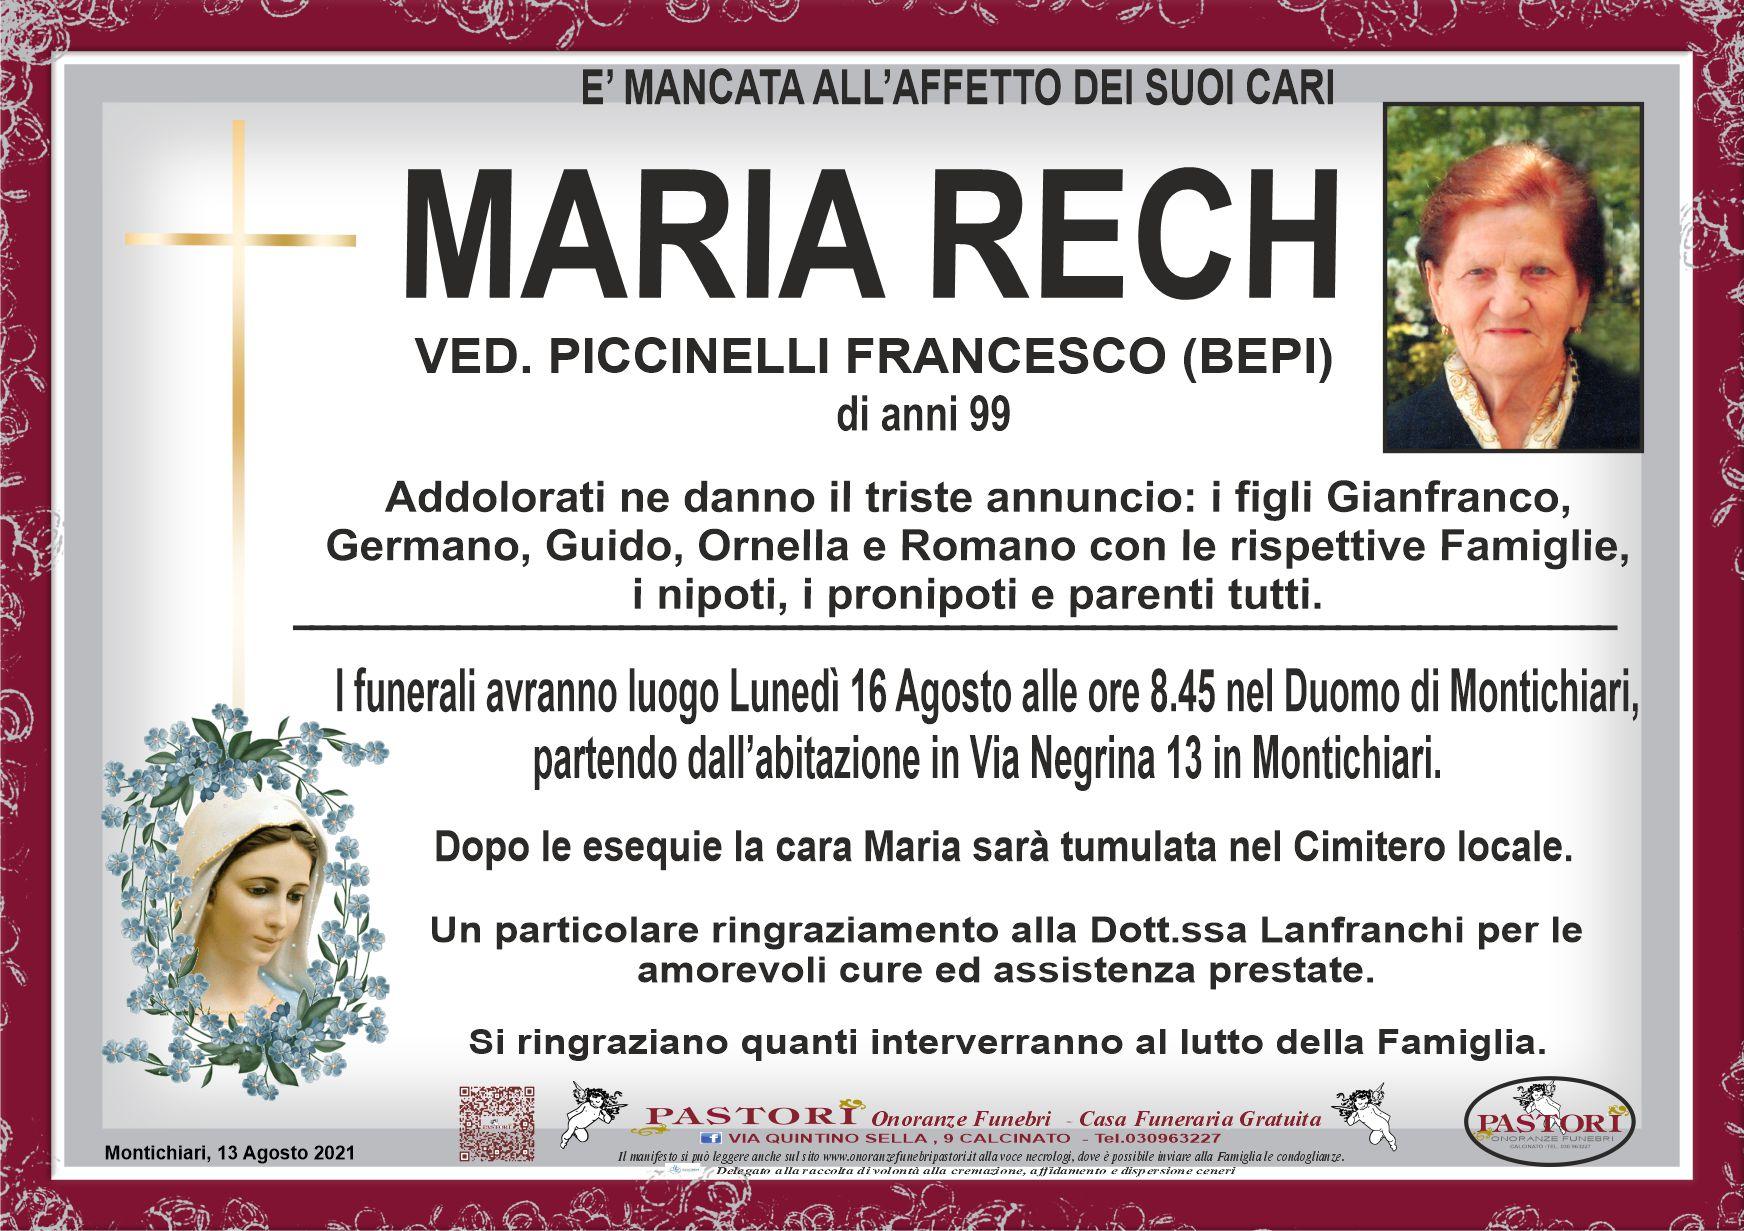 Maria Rech